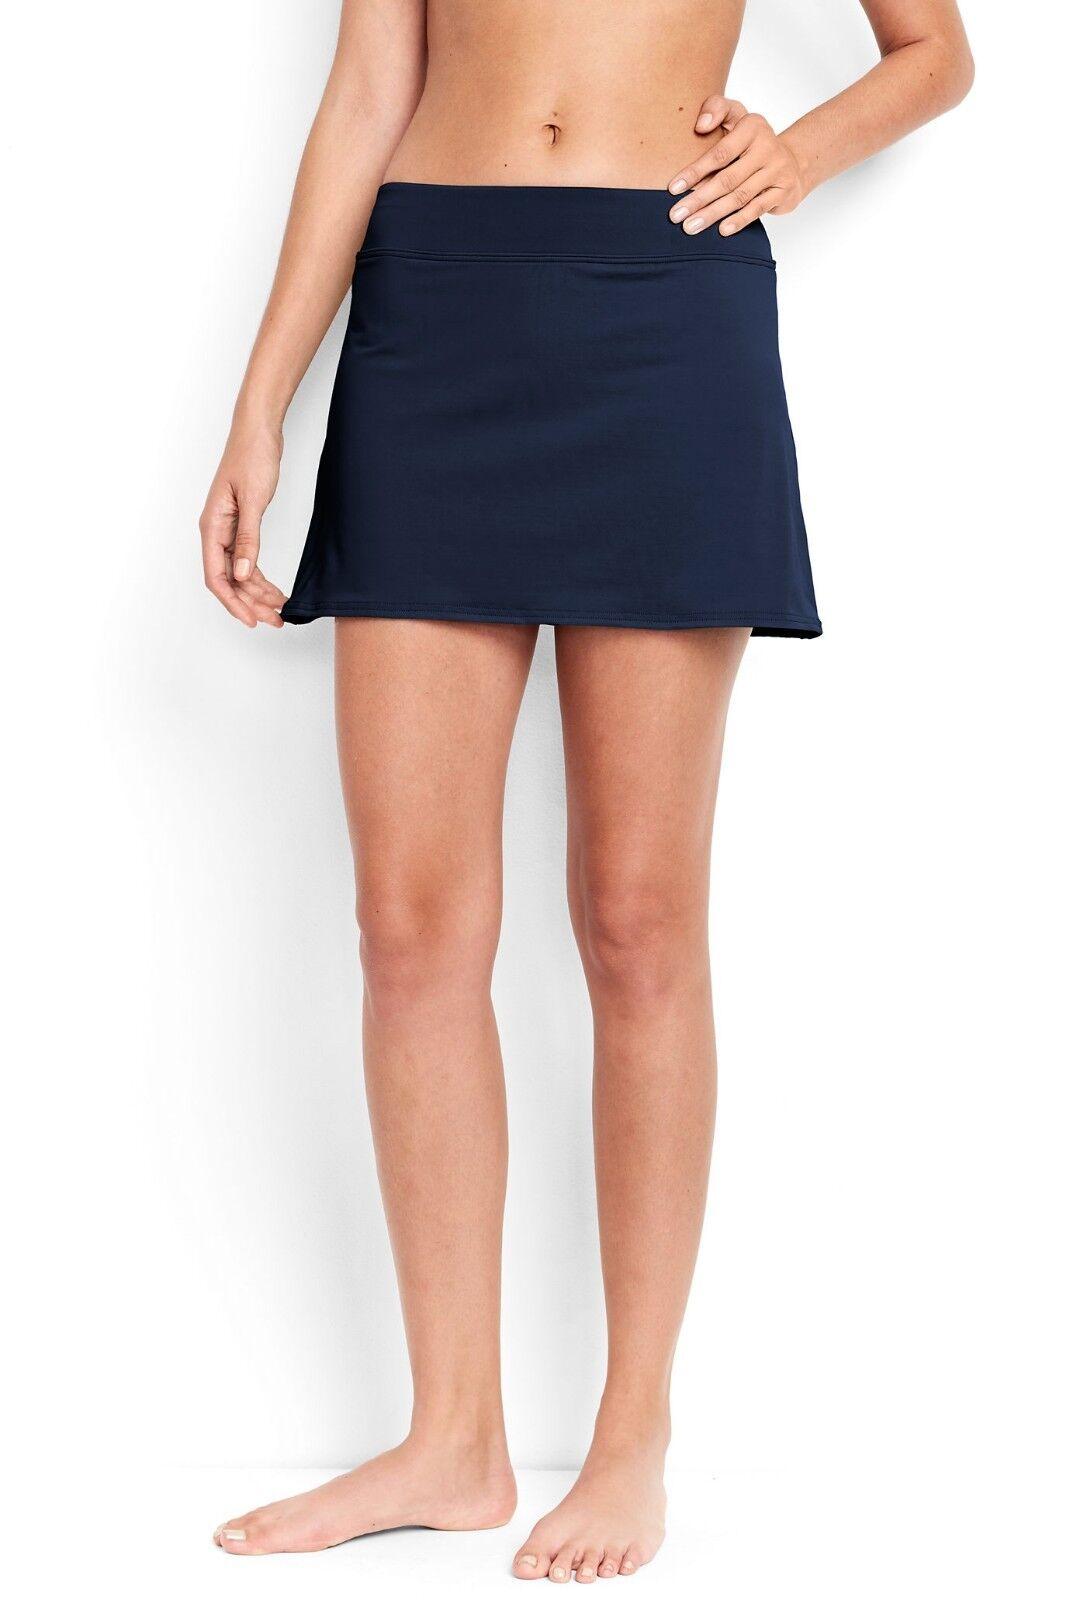 Lands'End Women's SwimMini Skirt Deep Sea Size 4 item J